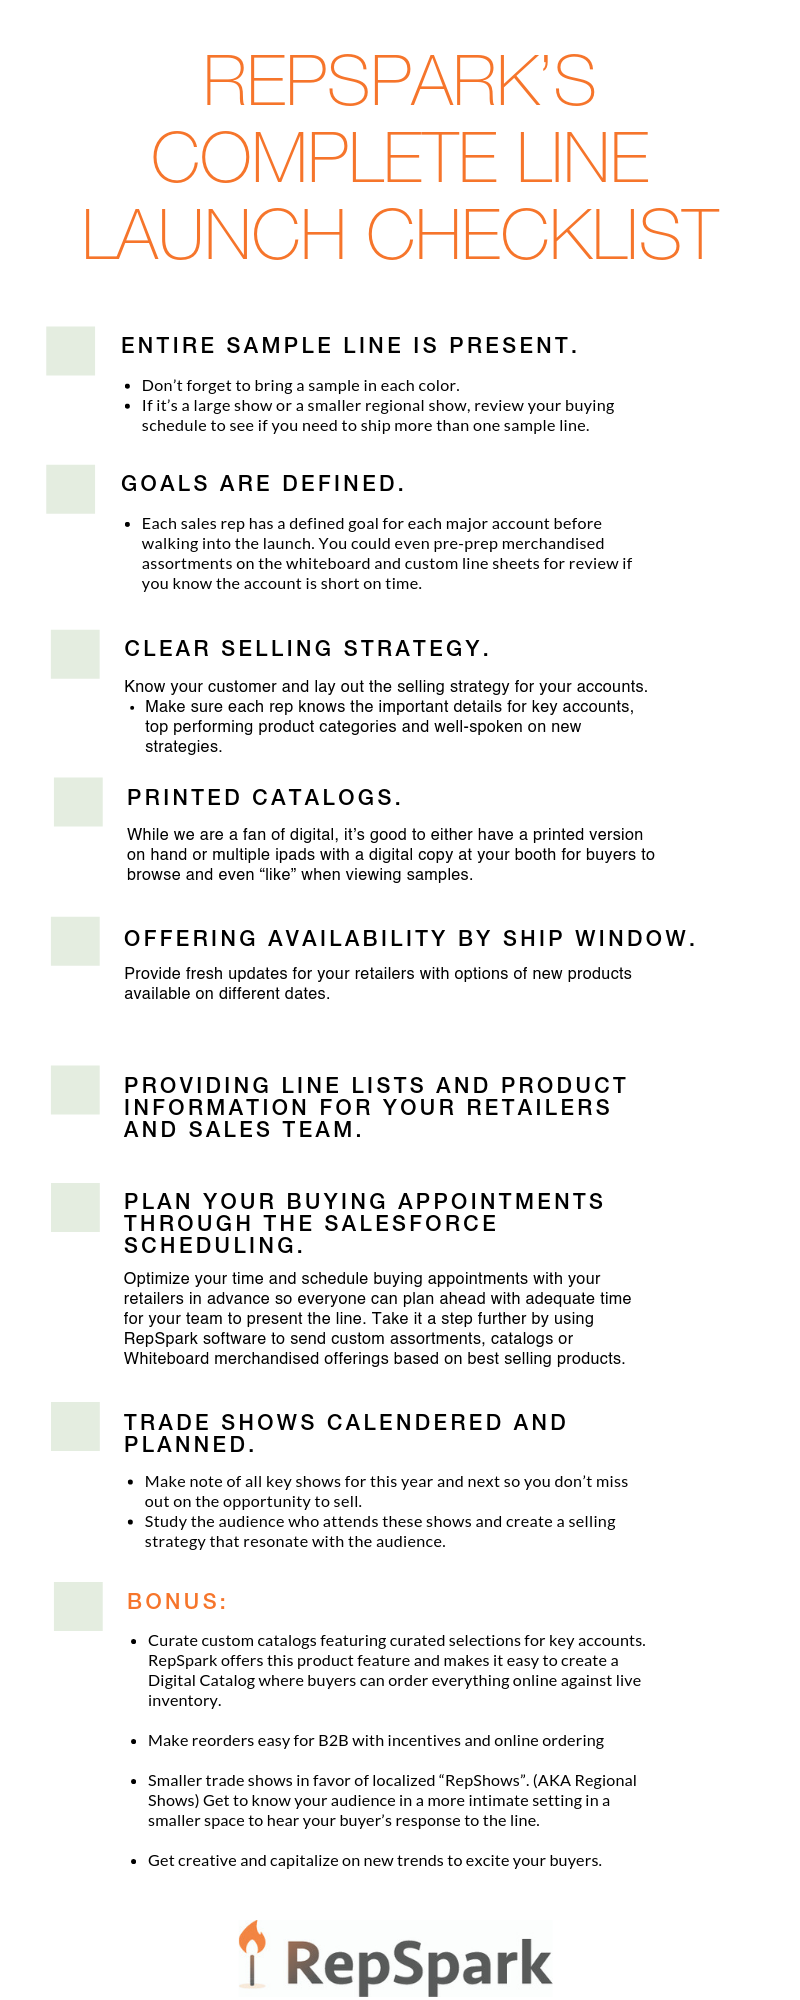 RepSpark's Complete Line Launch Checklist